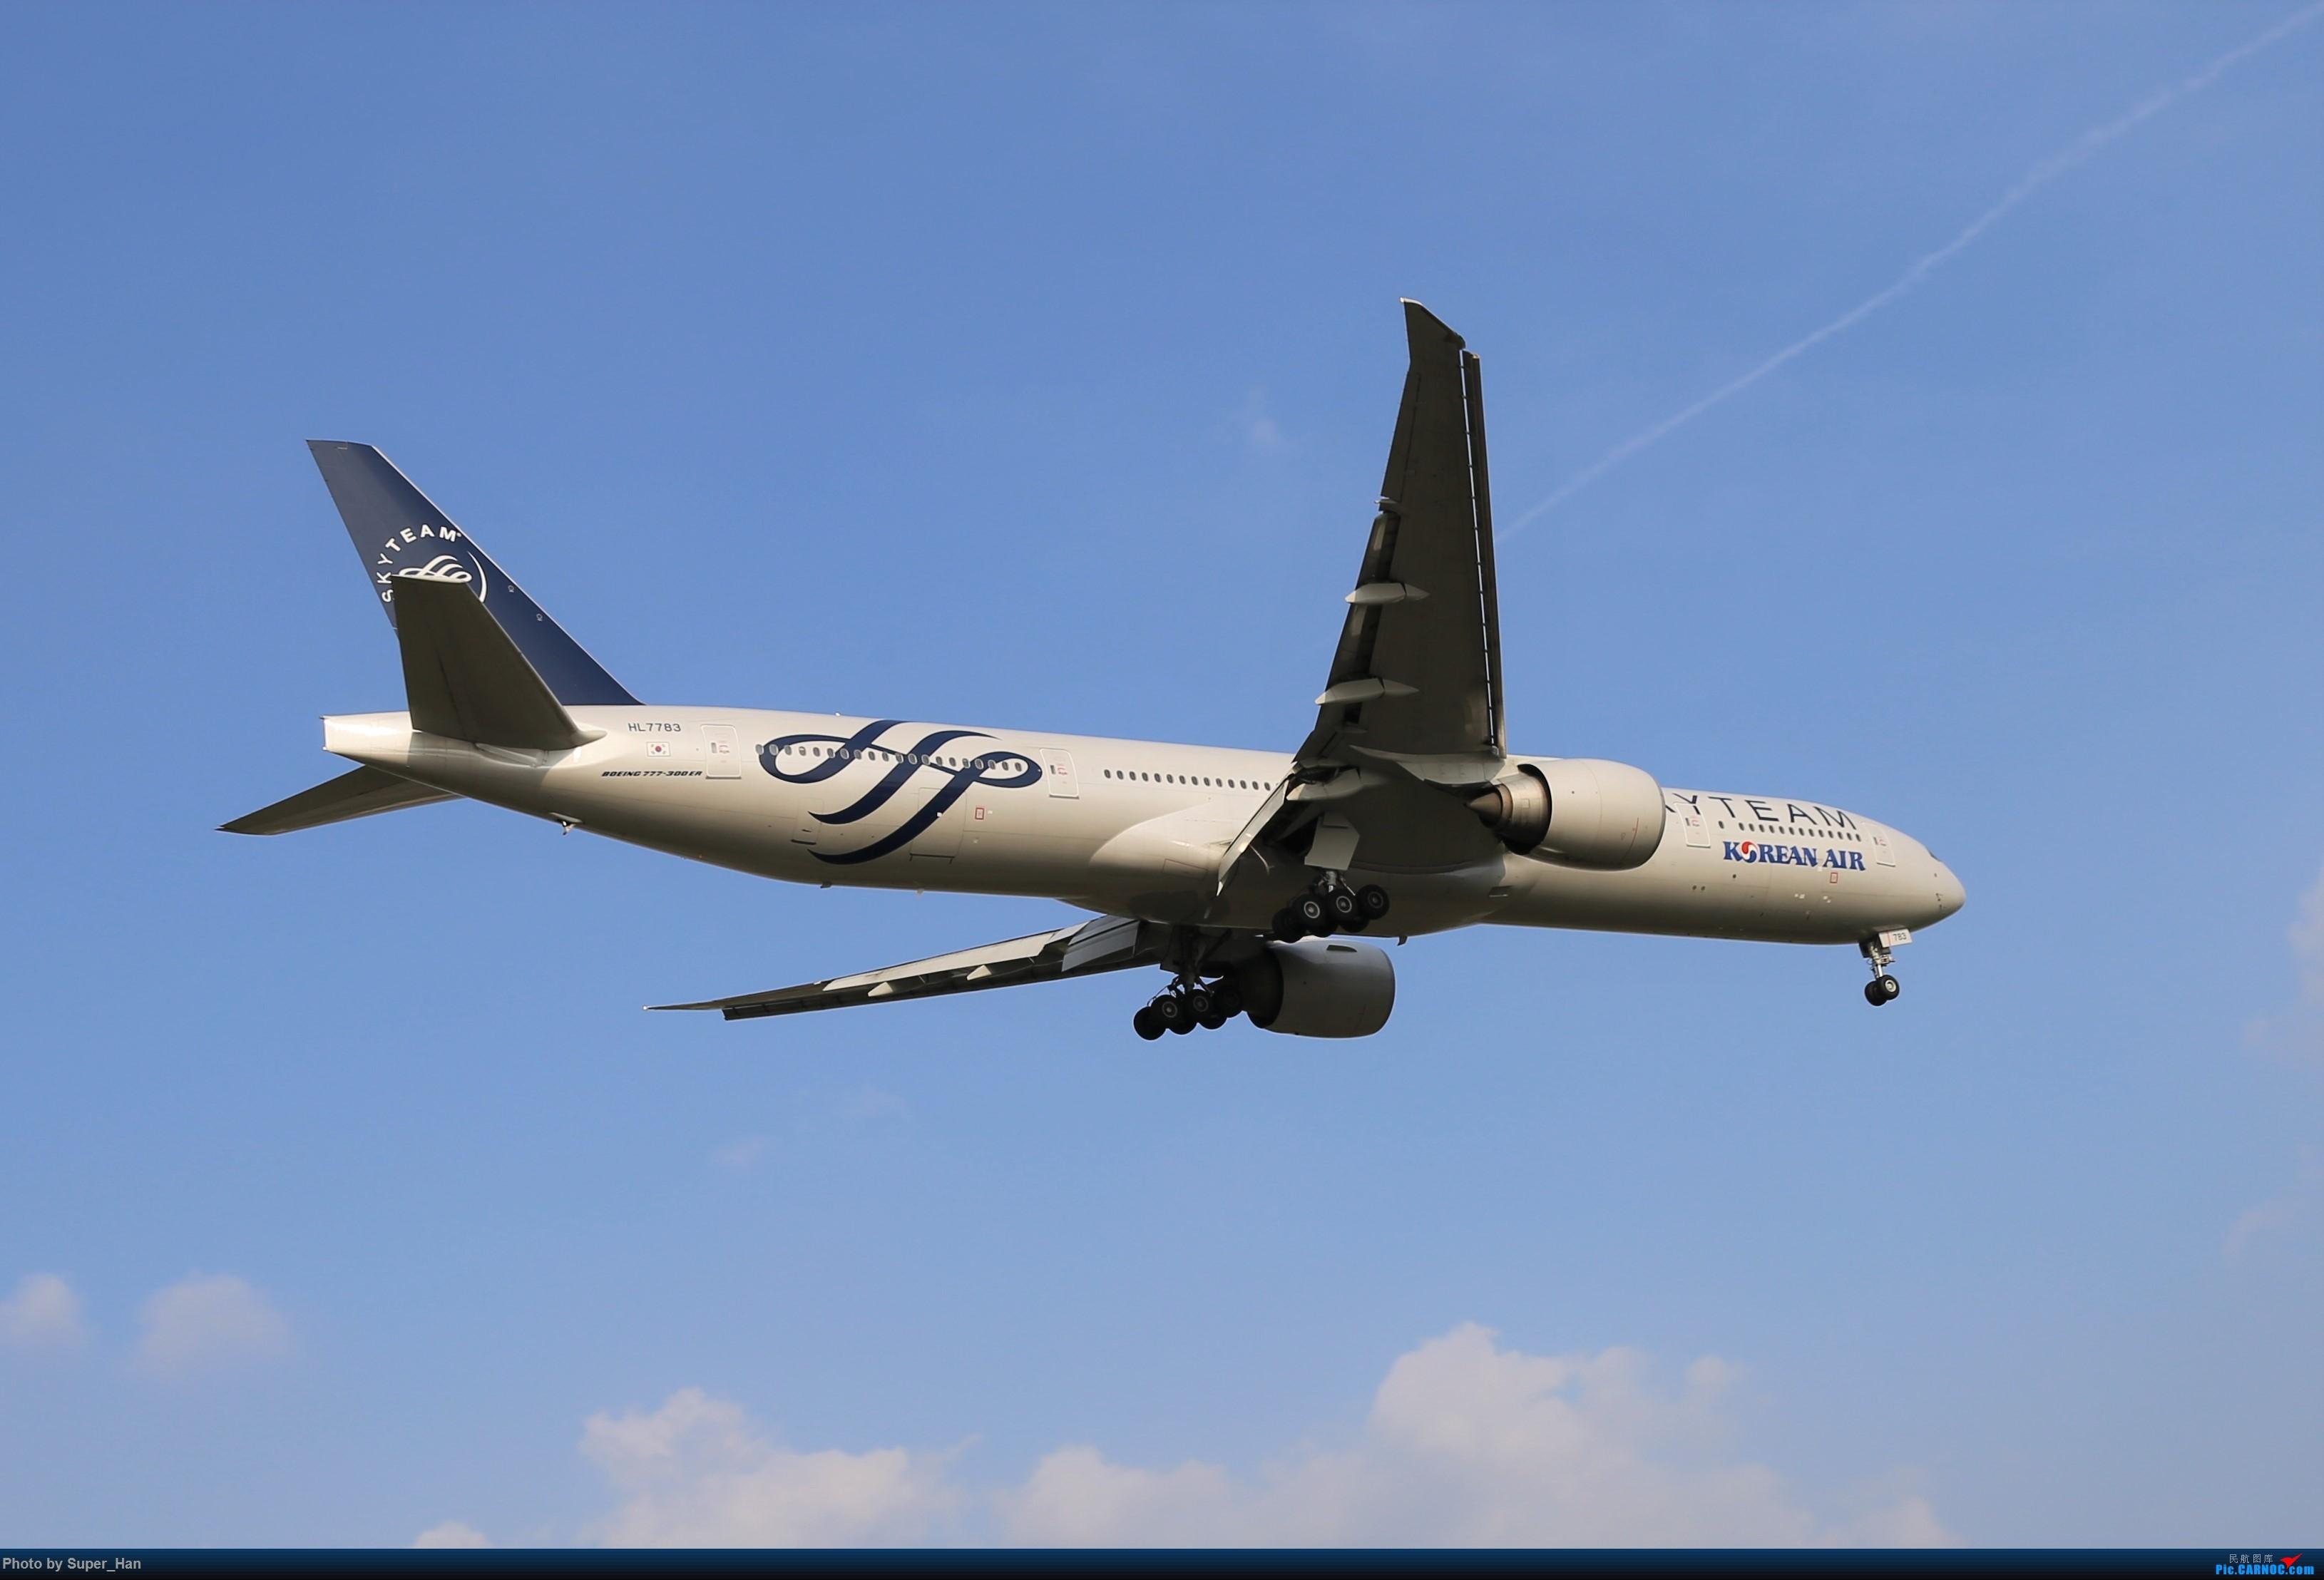 Re:[原创]【杭州飞友会】0715去虹桥说走就走【777篇】 BOEING 777-300ER HL7783 中国上海虹桥国际机场